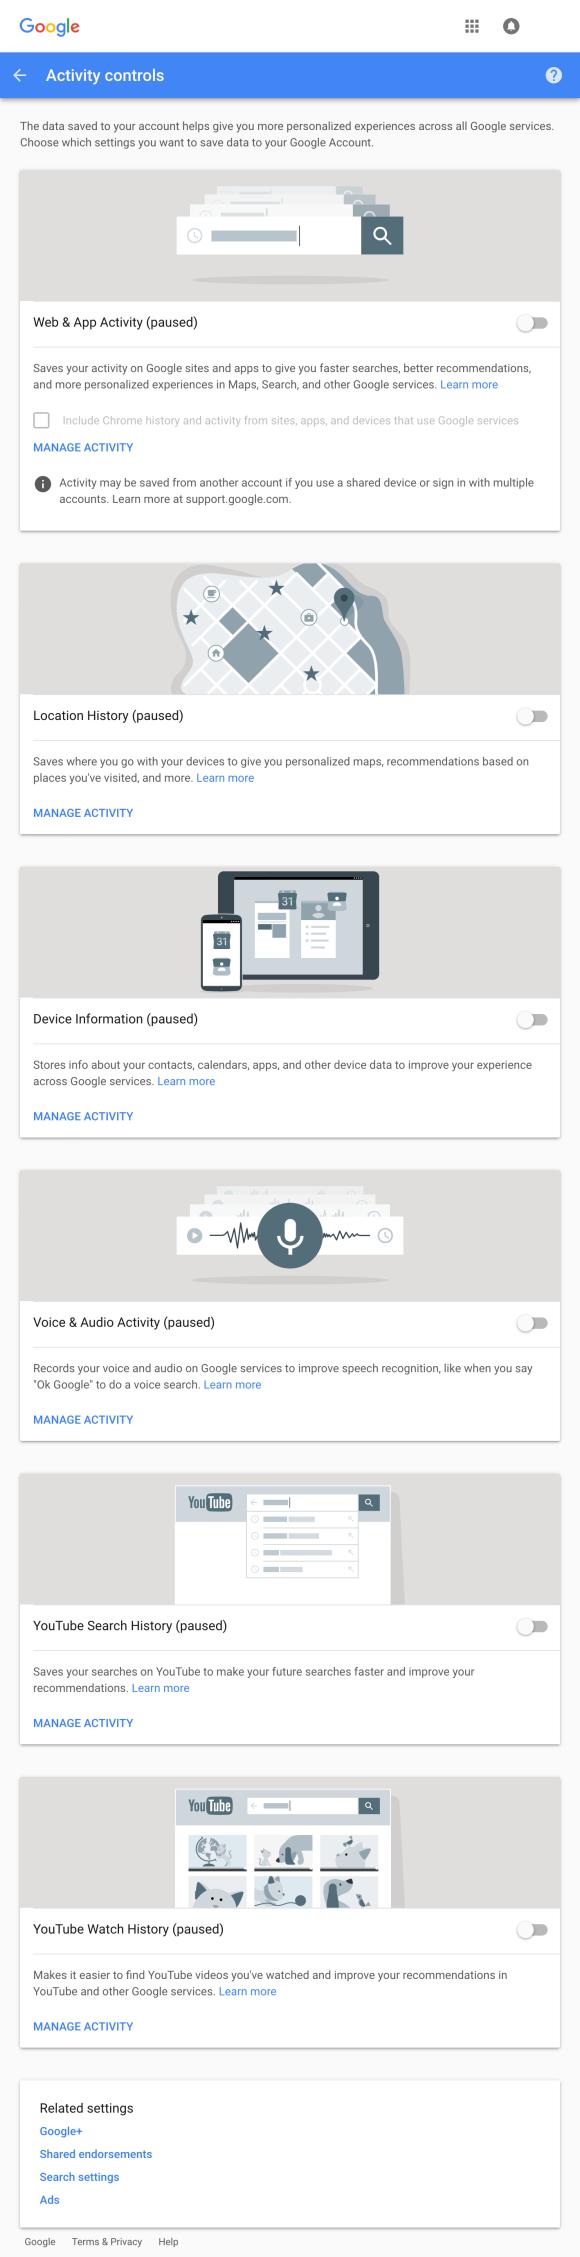 Screenshot of Google's Activity Controls permissions settings webpage